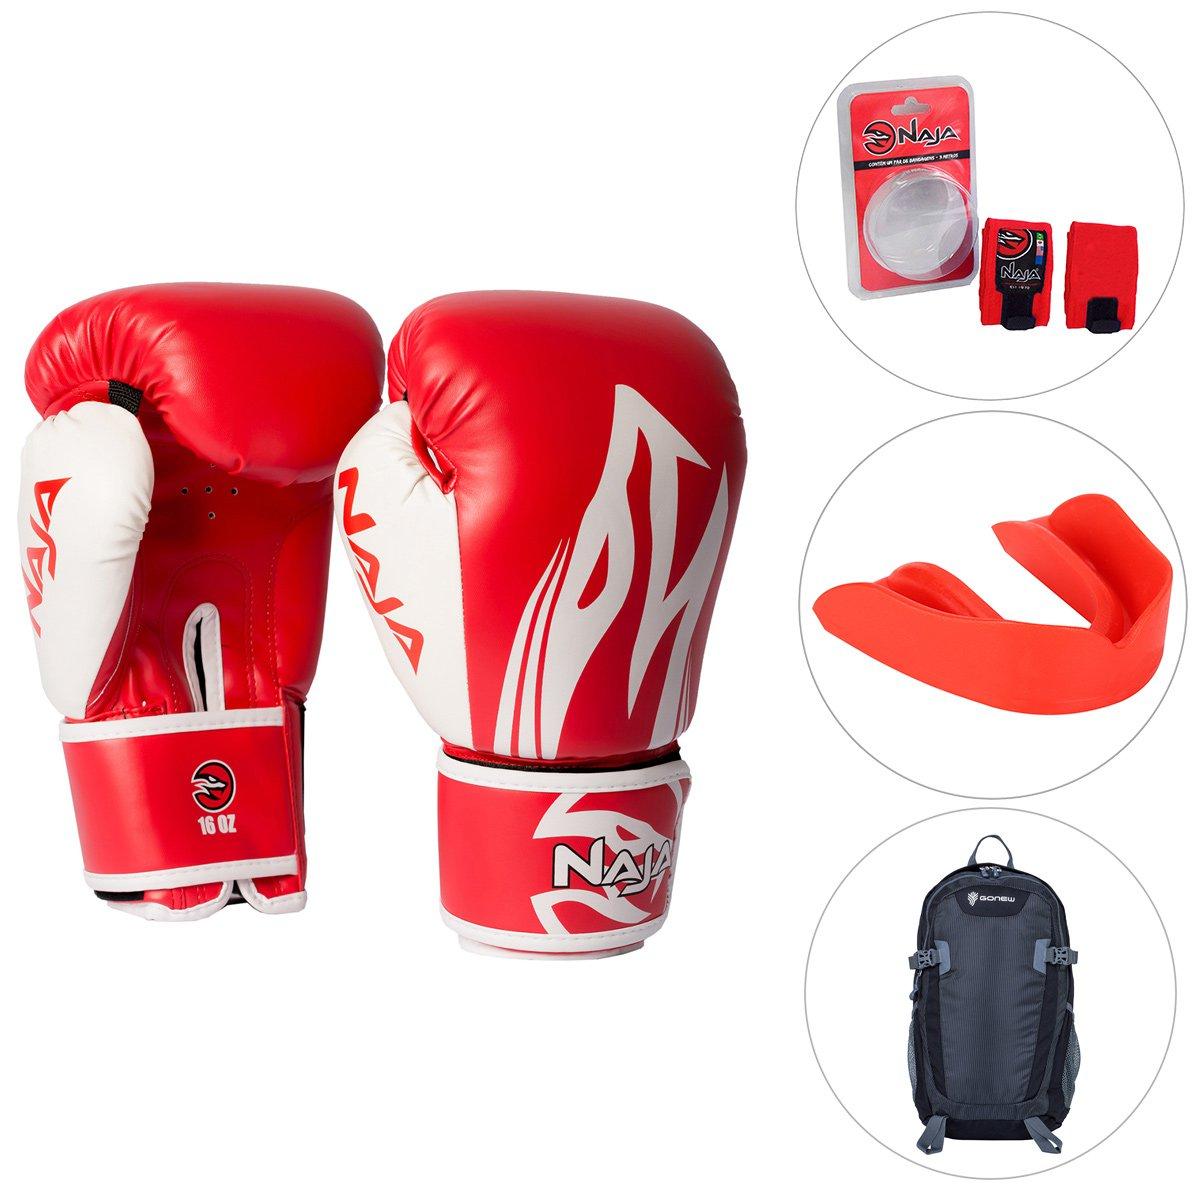 8182997c6 Kit Luva de Boxe   Muay Thai Naja Extreme 10OZ + Bandagem 3M + Protetor +  Mochila GONEW Namibe - Compre Agora